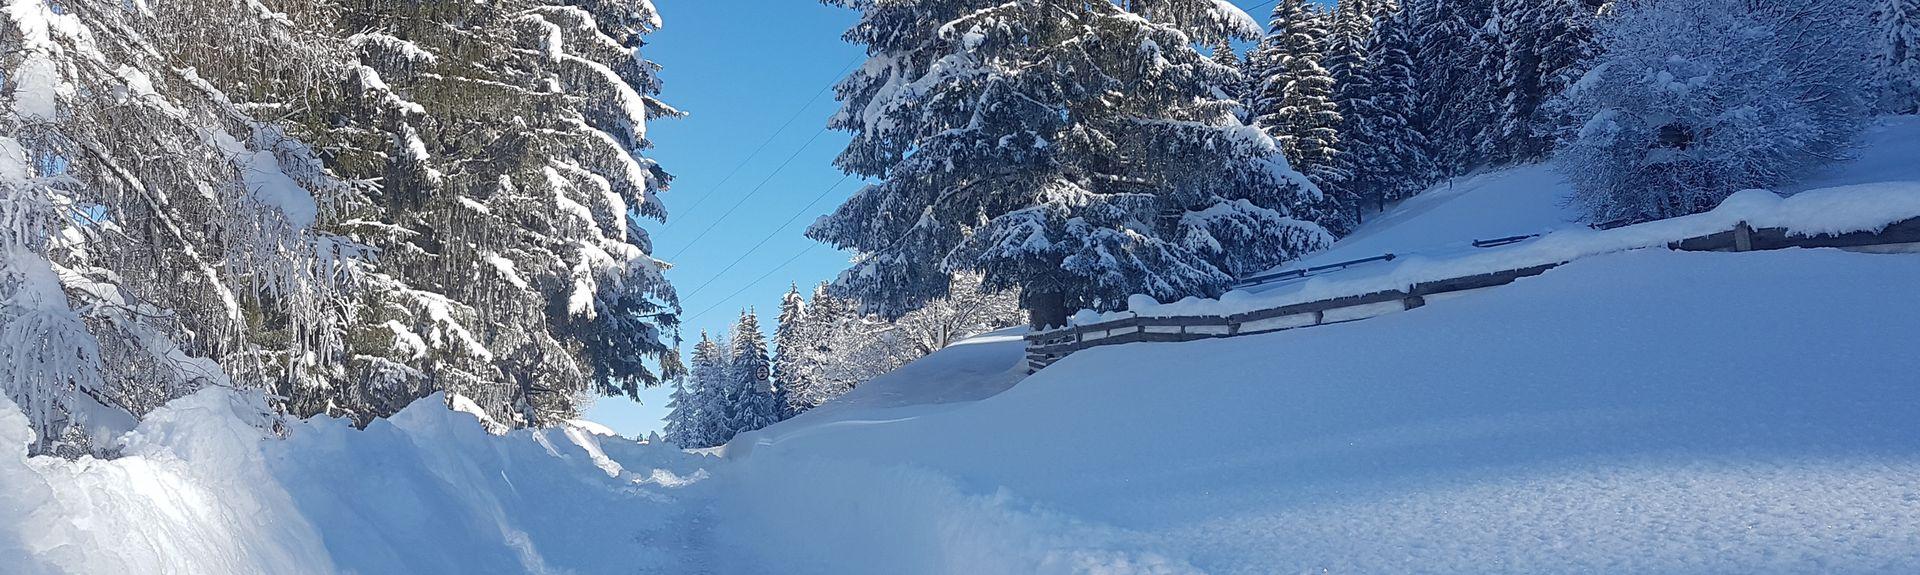 Innervillgraten, Tyrol, Autriche